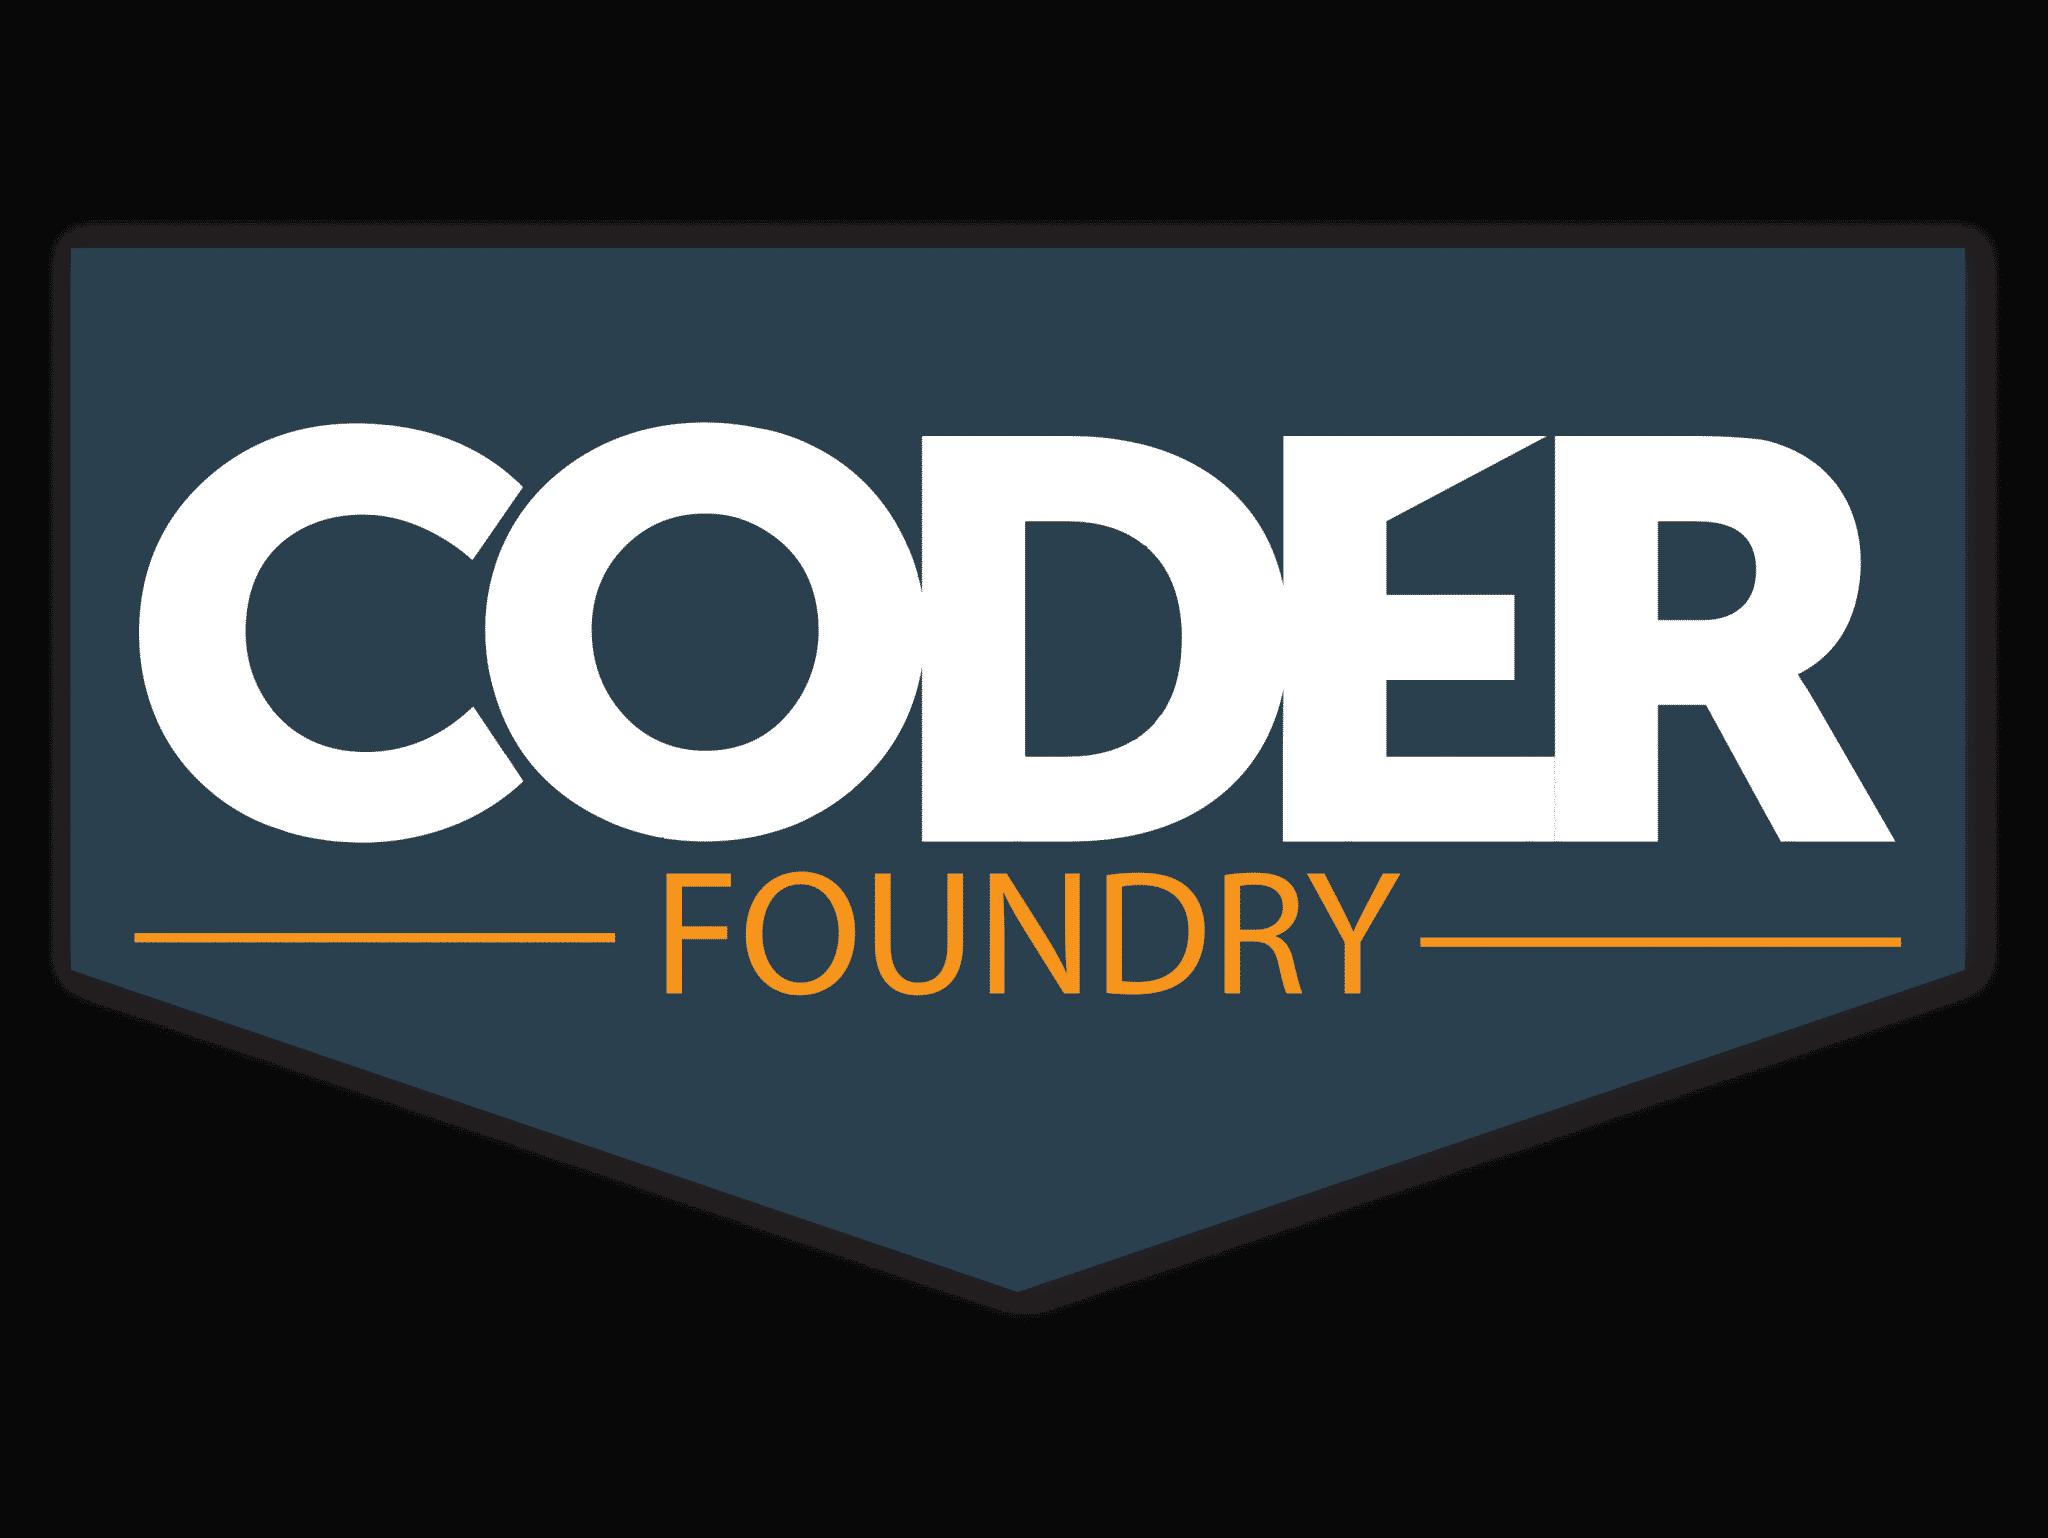 Coder Foundry .NET bootcamp